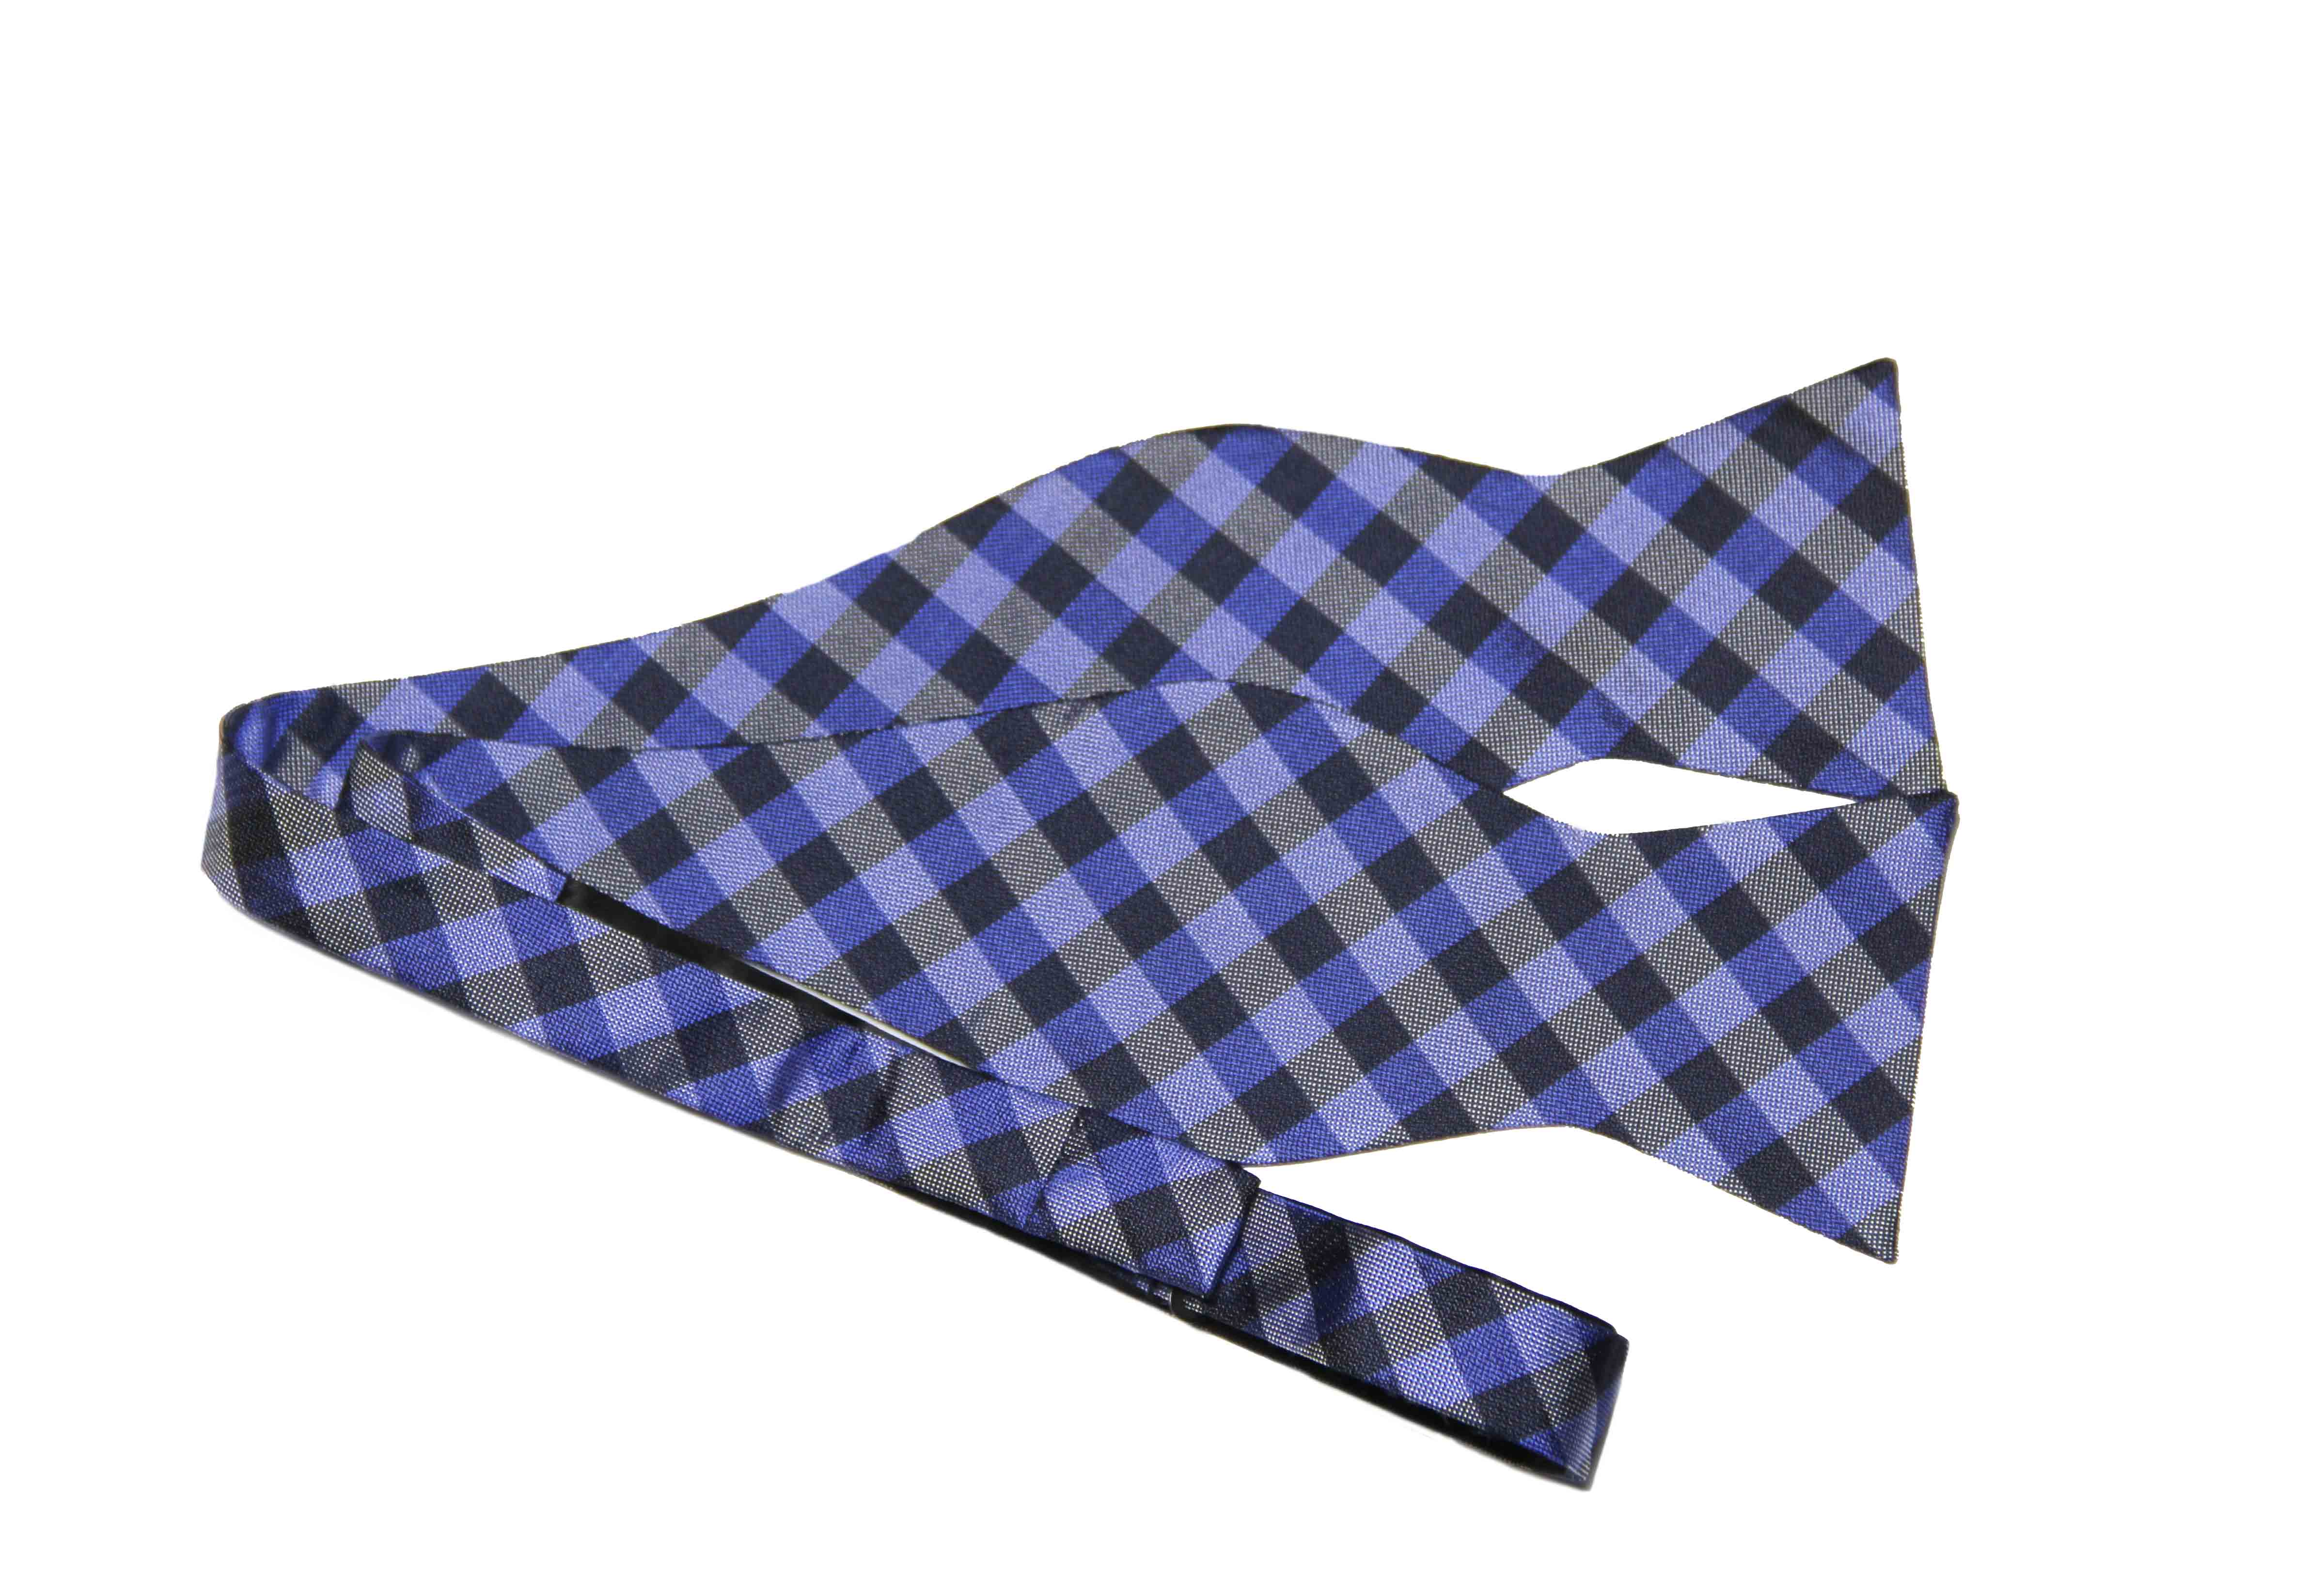 Calvin Klein Silk Bow Tie Blue Gray Lattice Check Men's